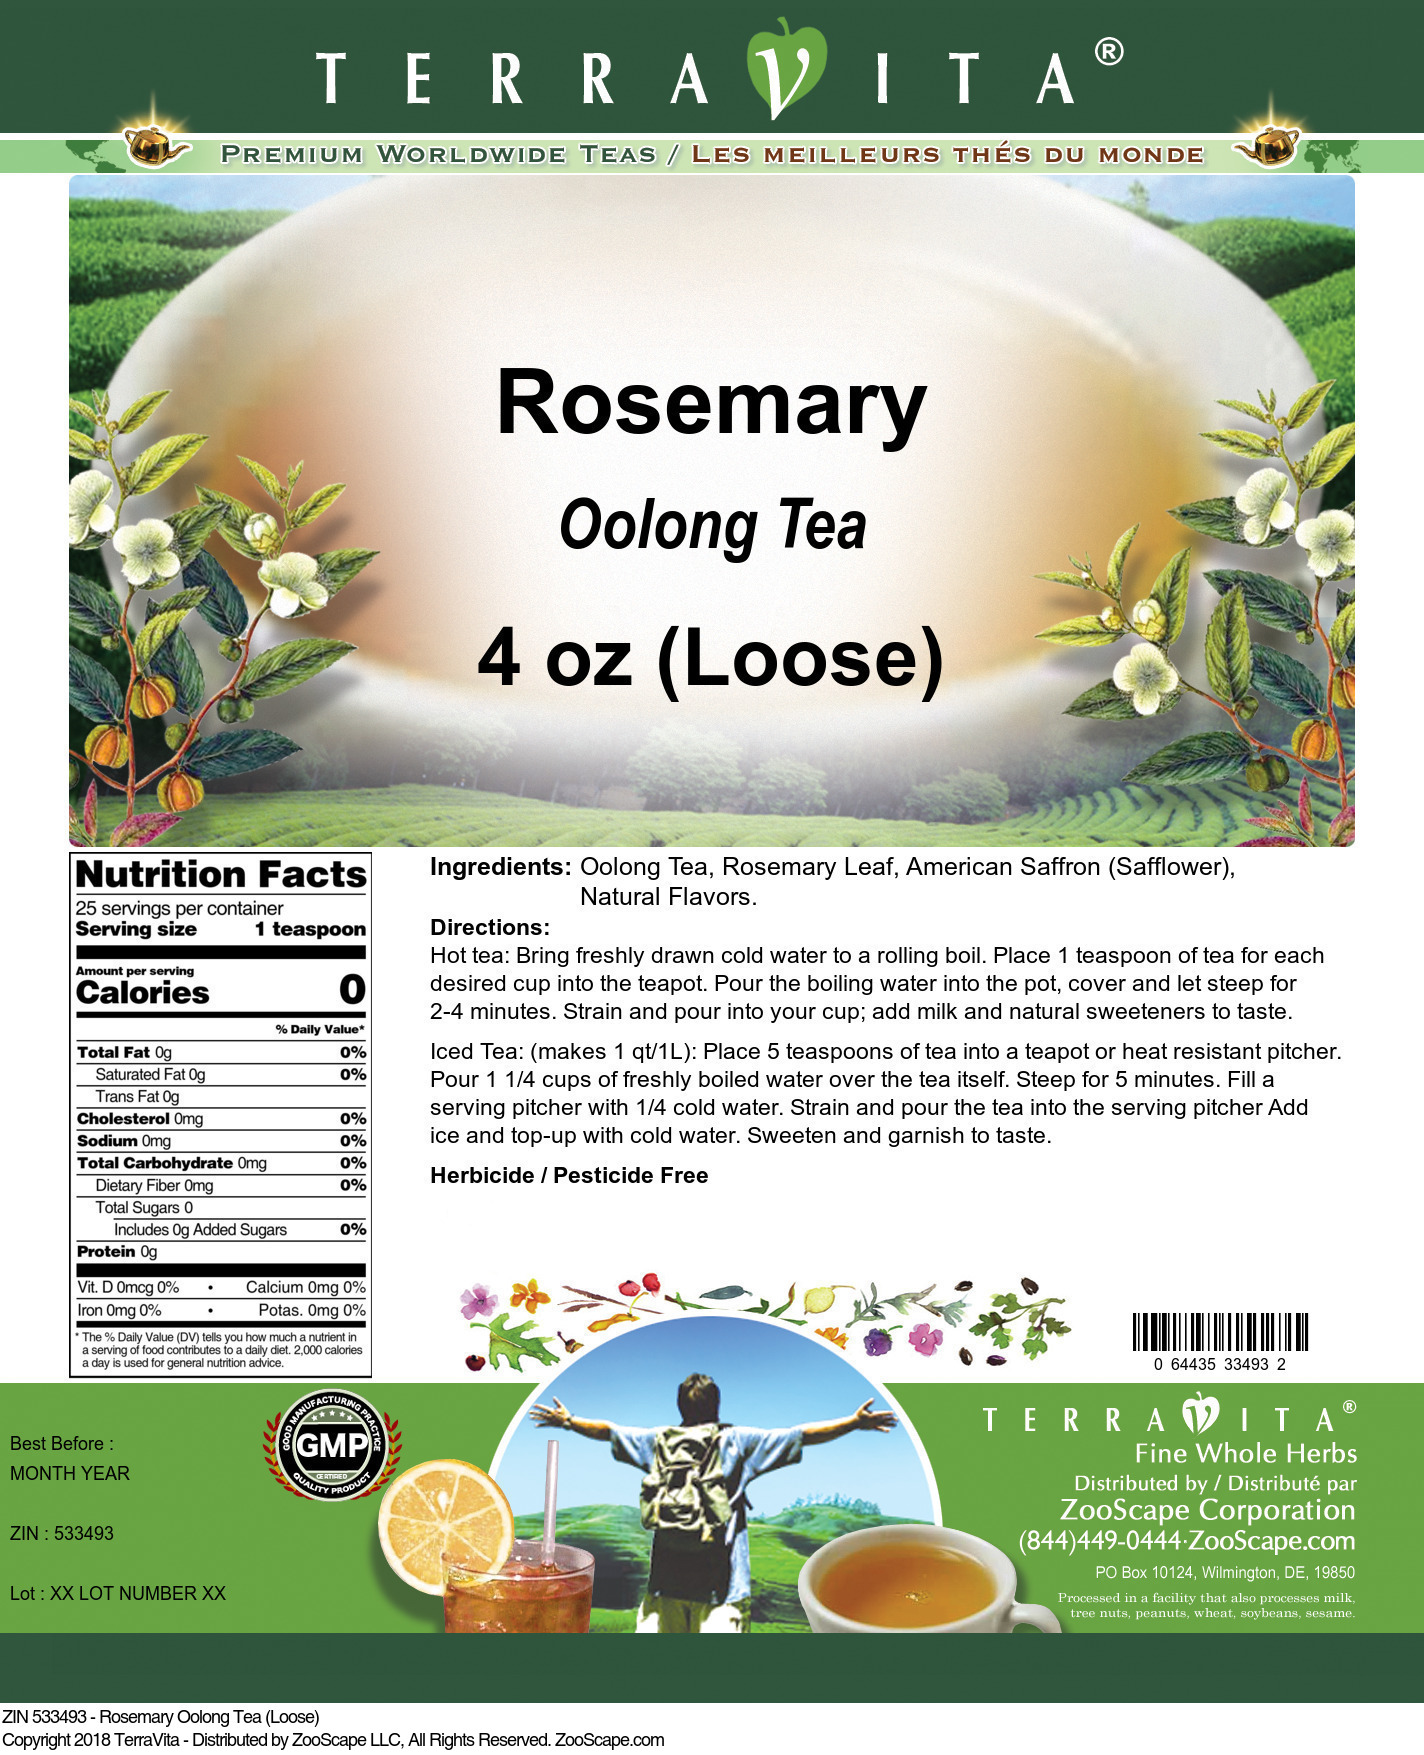 Rosemary Oolong Tea (Loose)